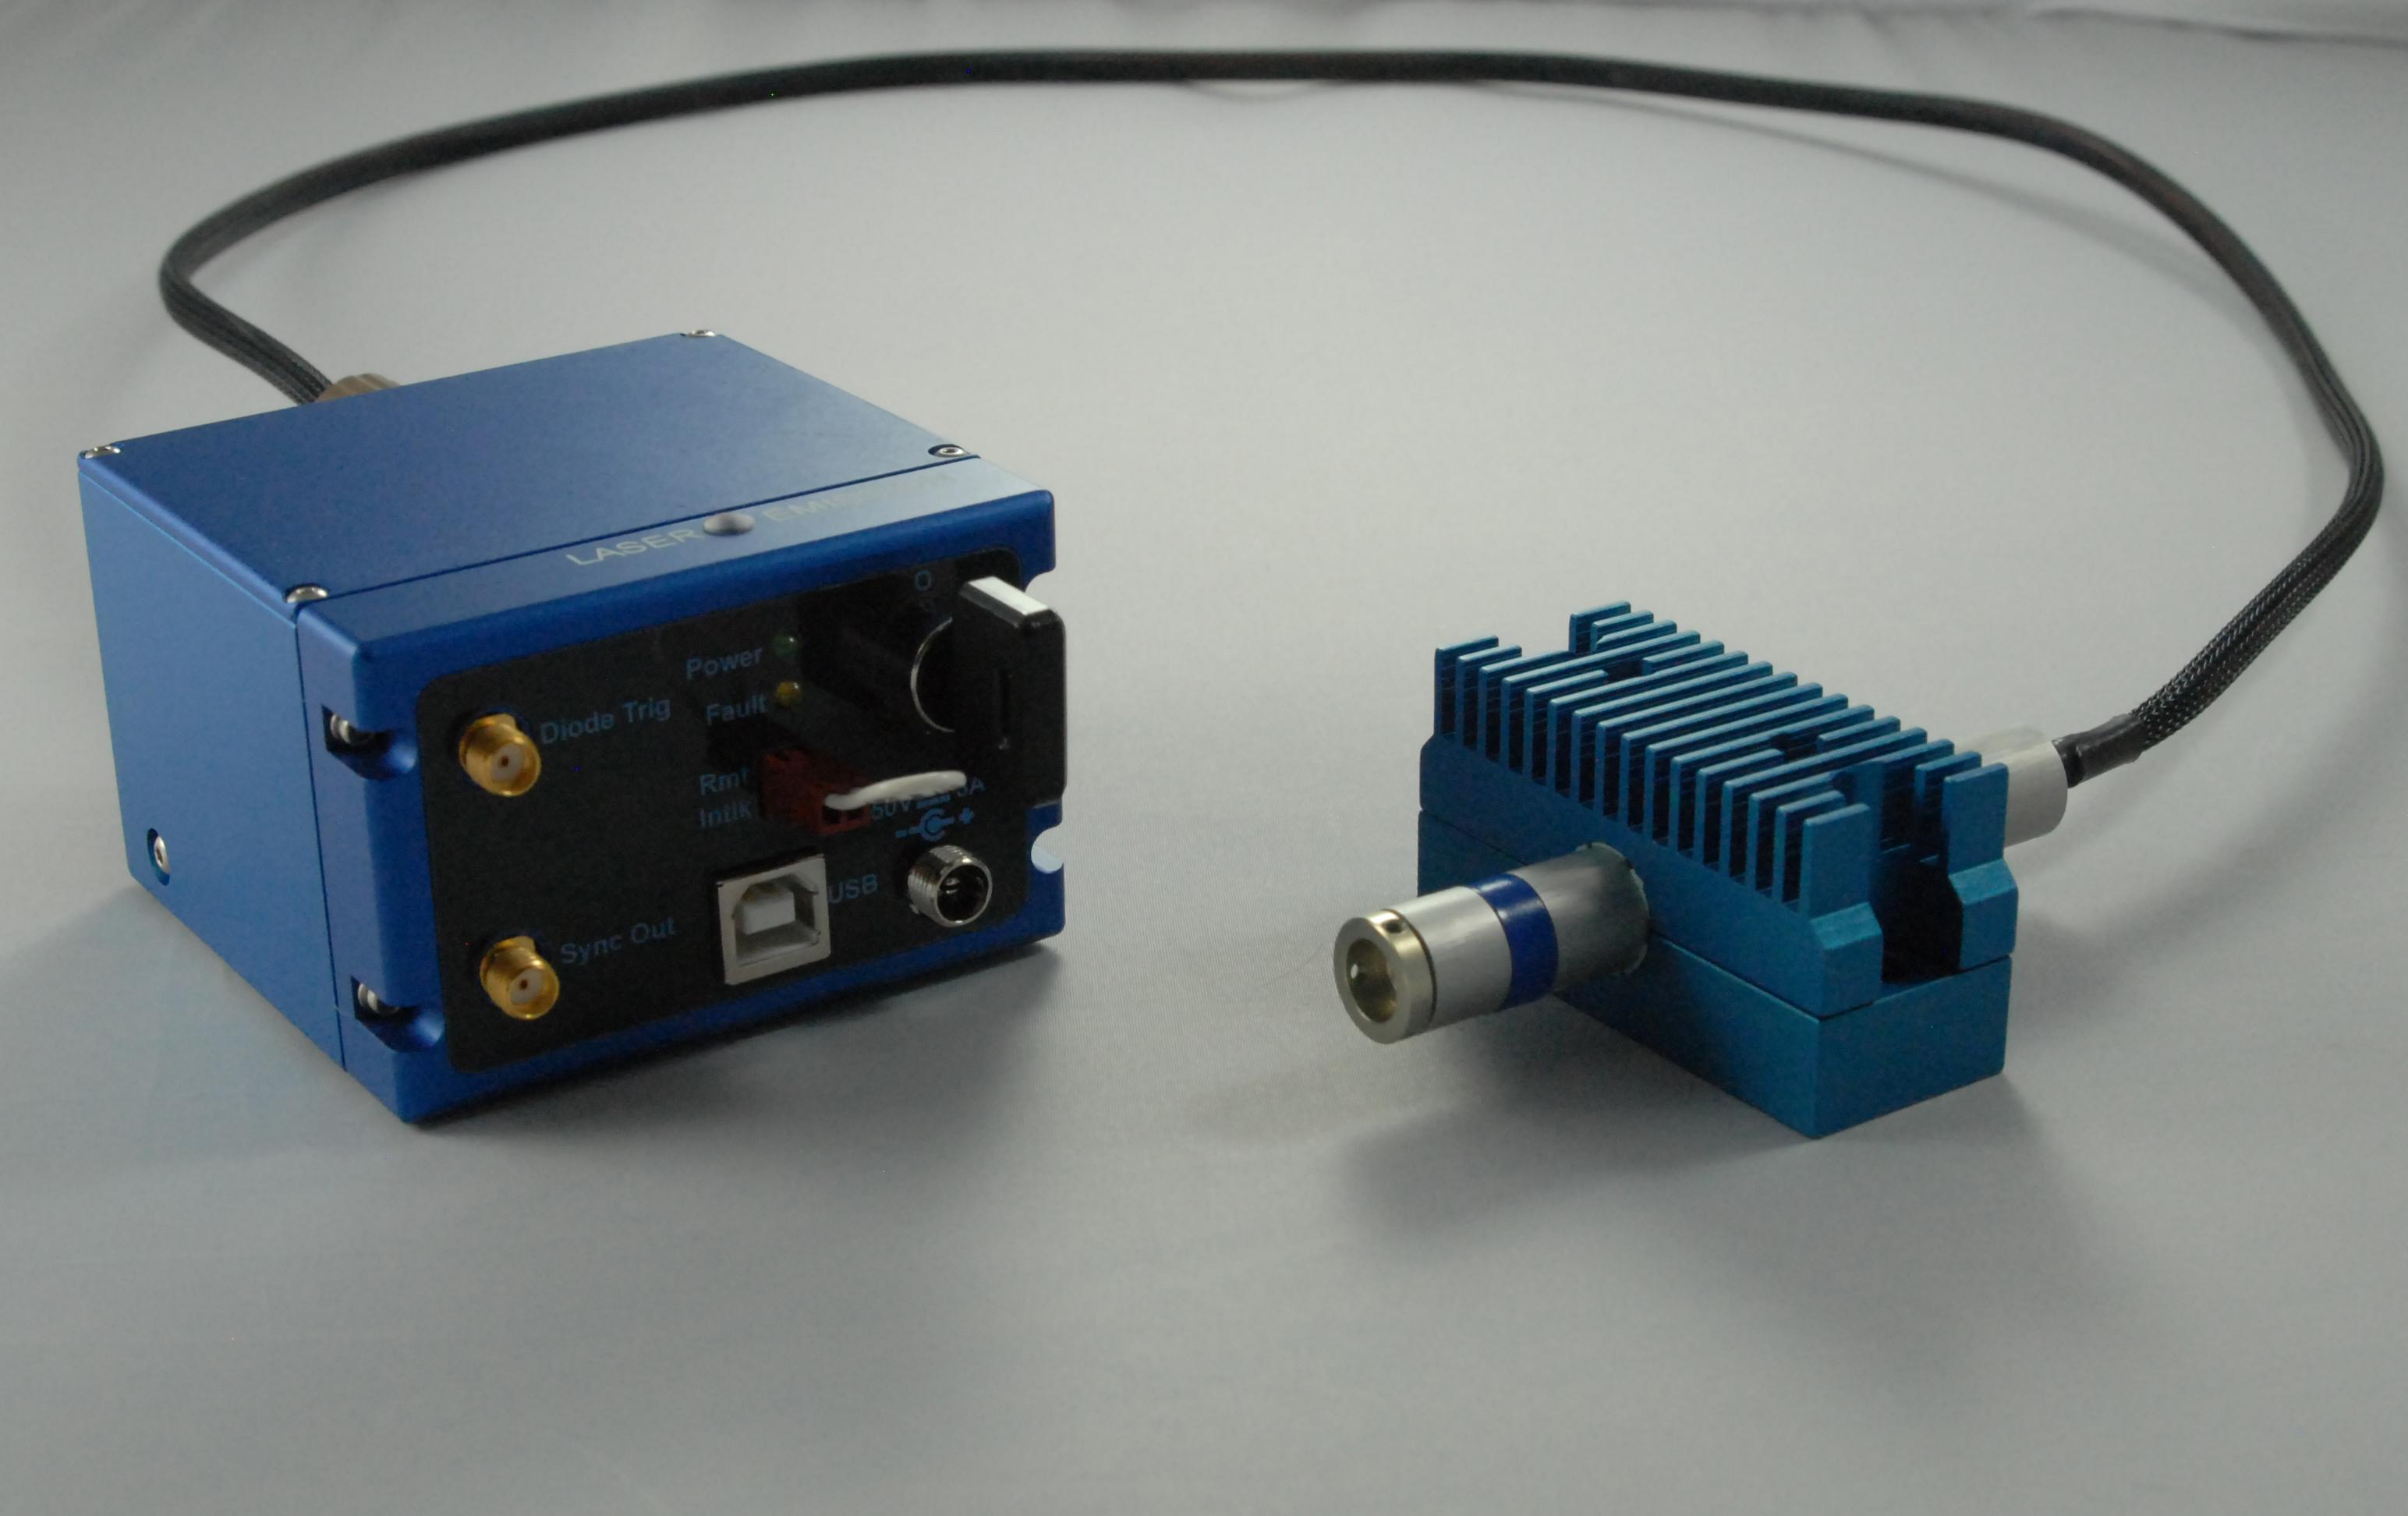 Microjewel-Laser-image-2